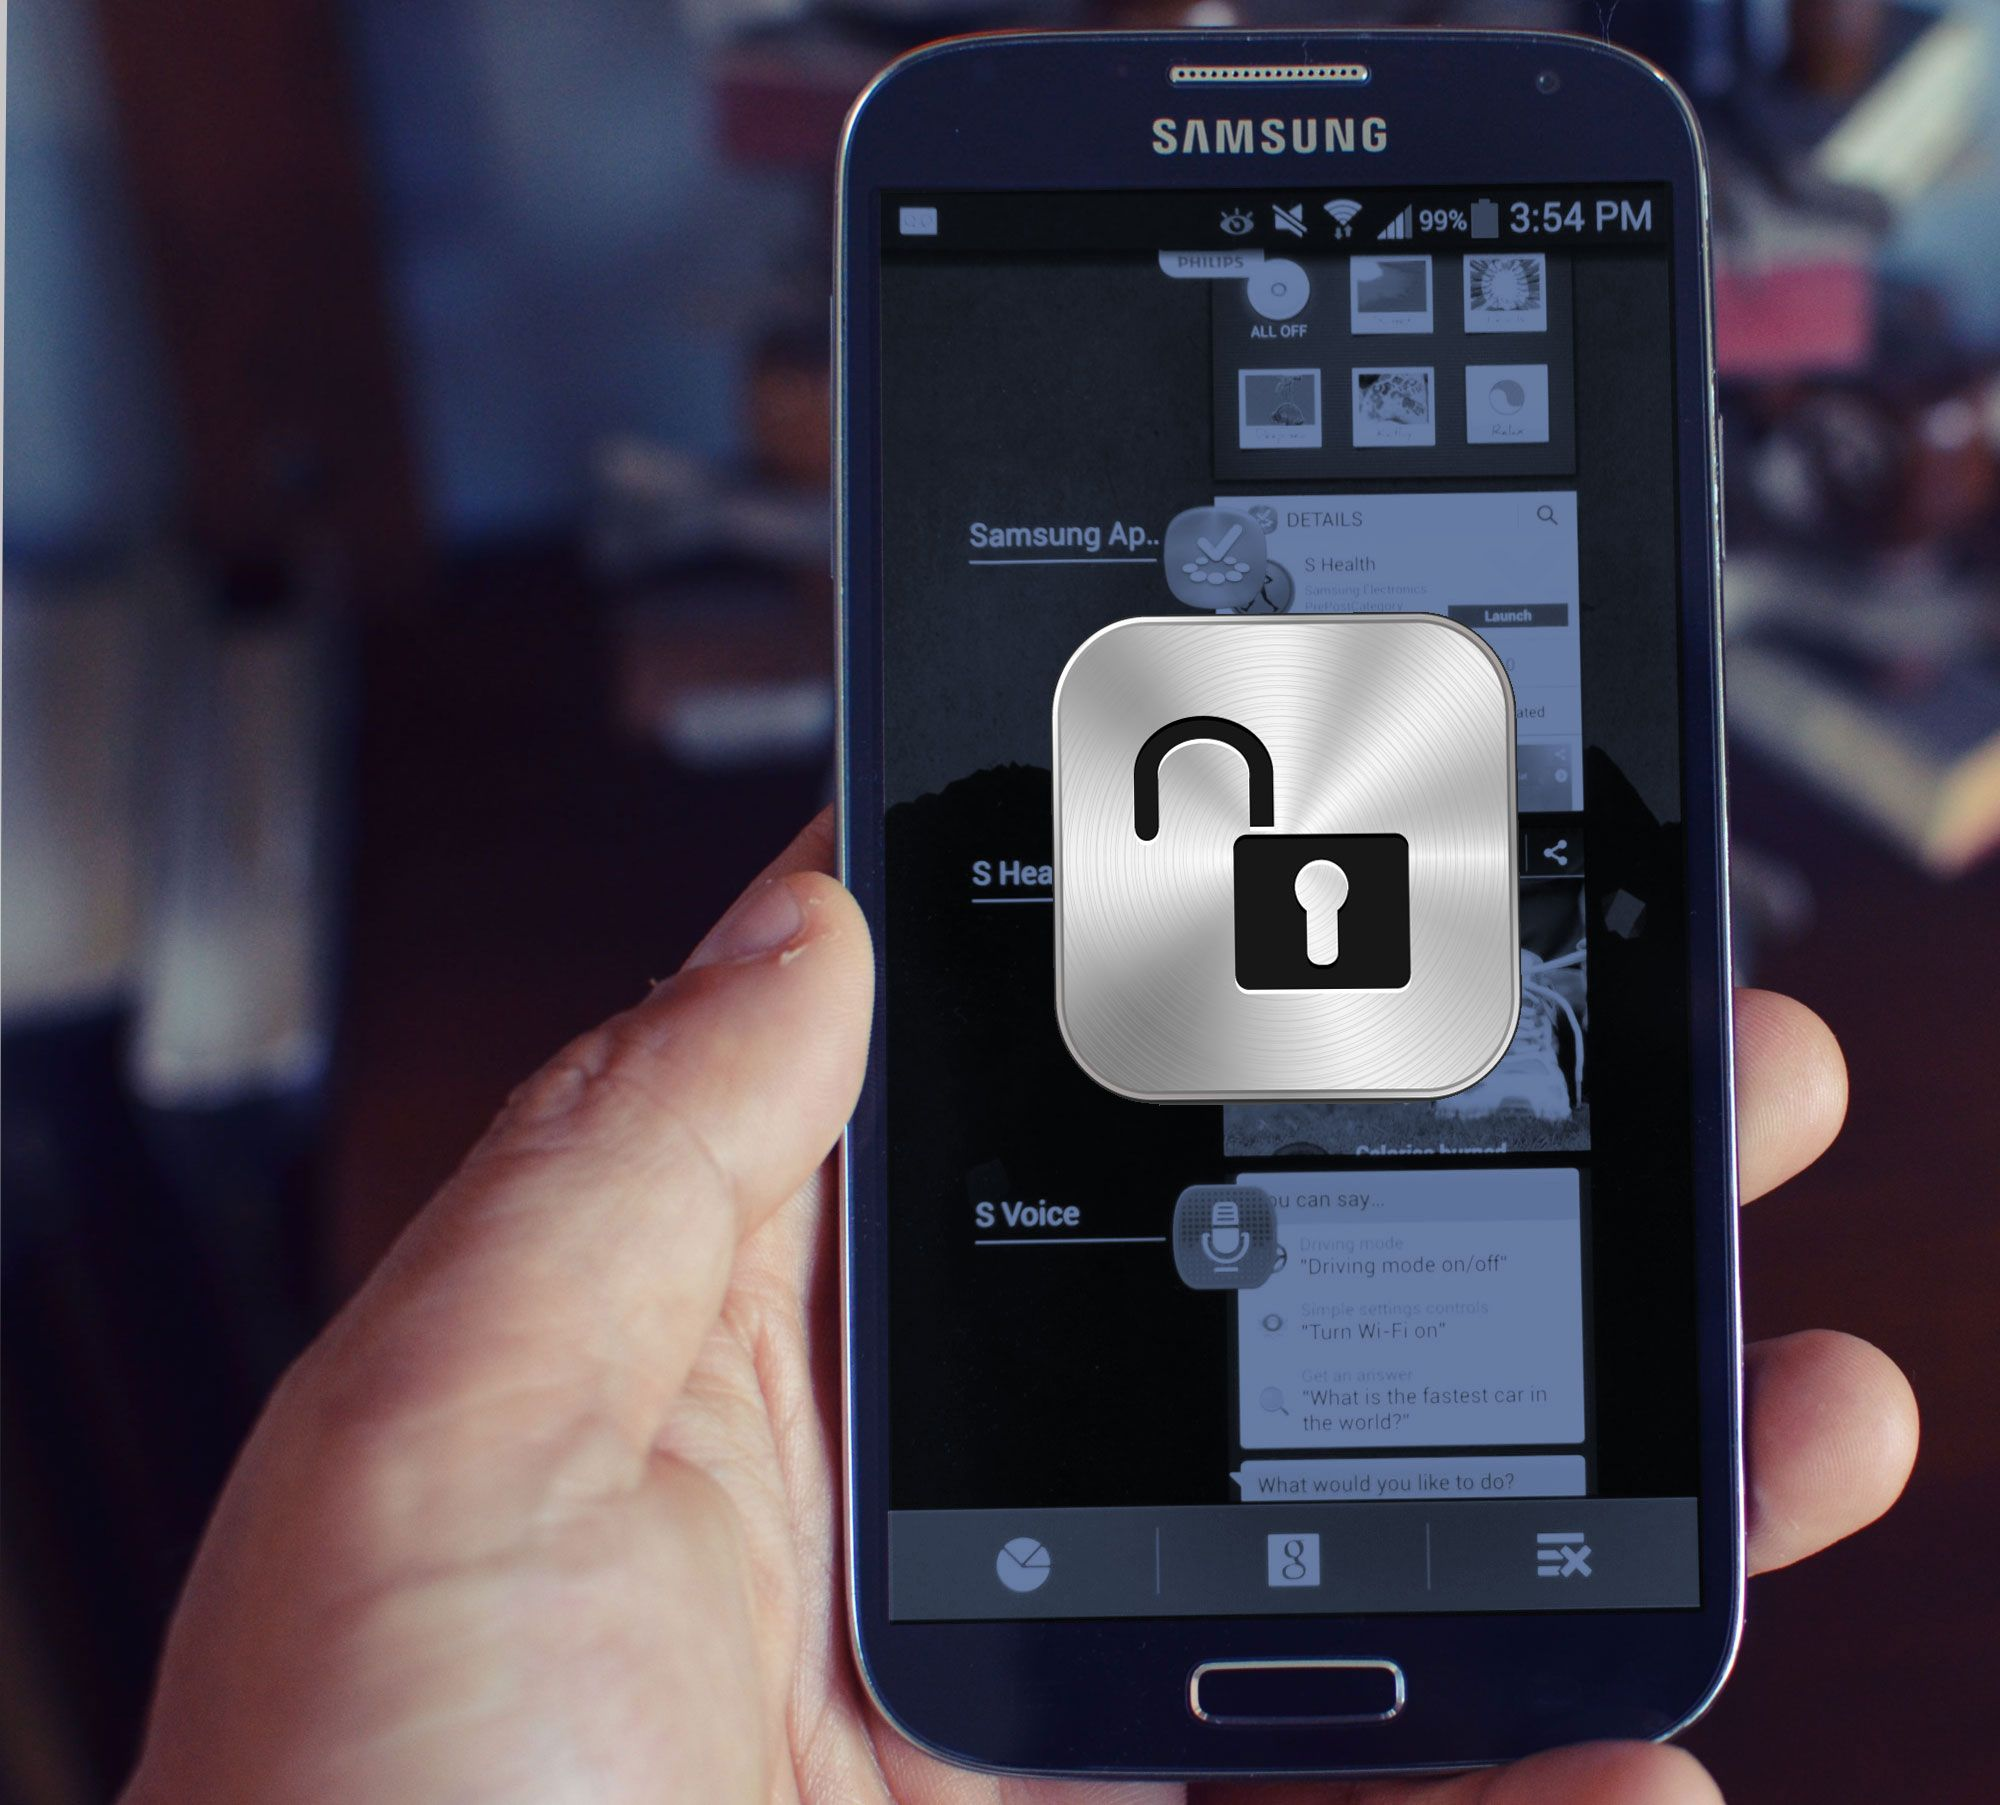 ef4856213ccc141d6620b3694ef64576 - How To Get The Most Out Of My Galaxy S4